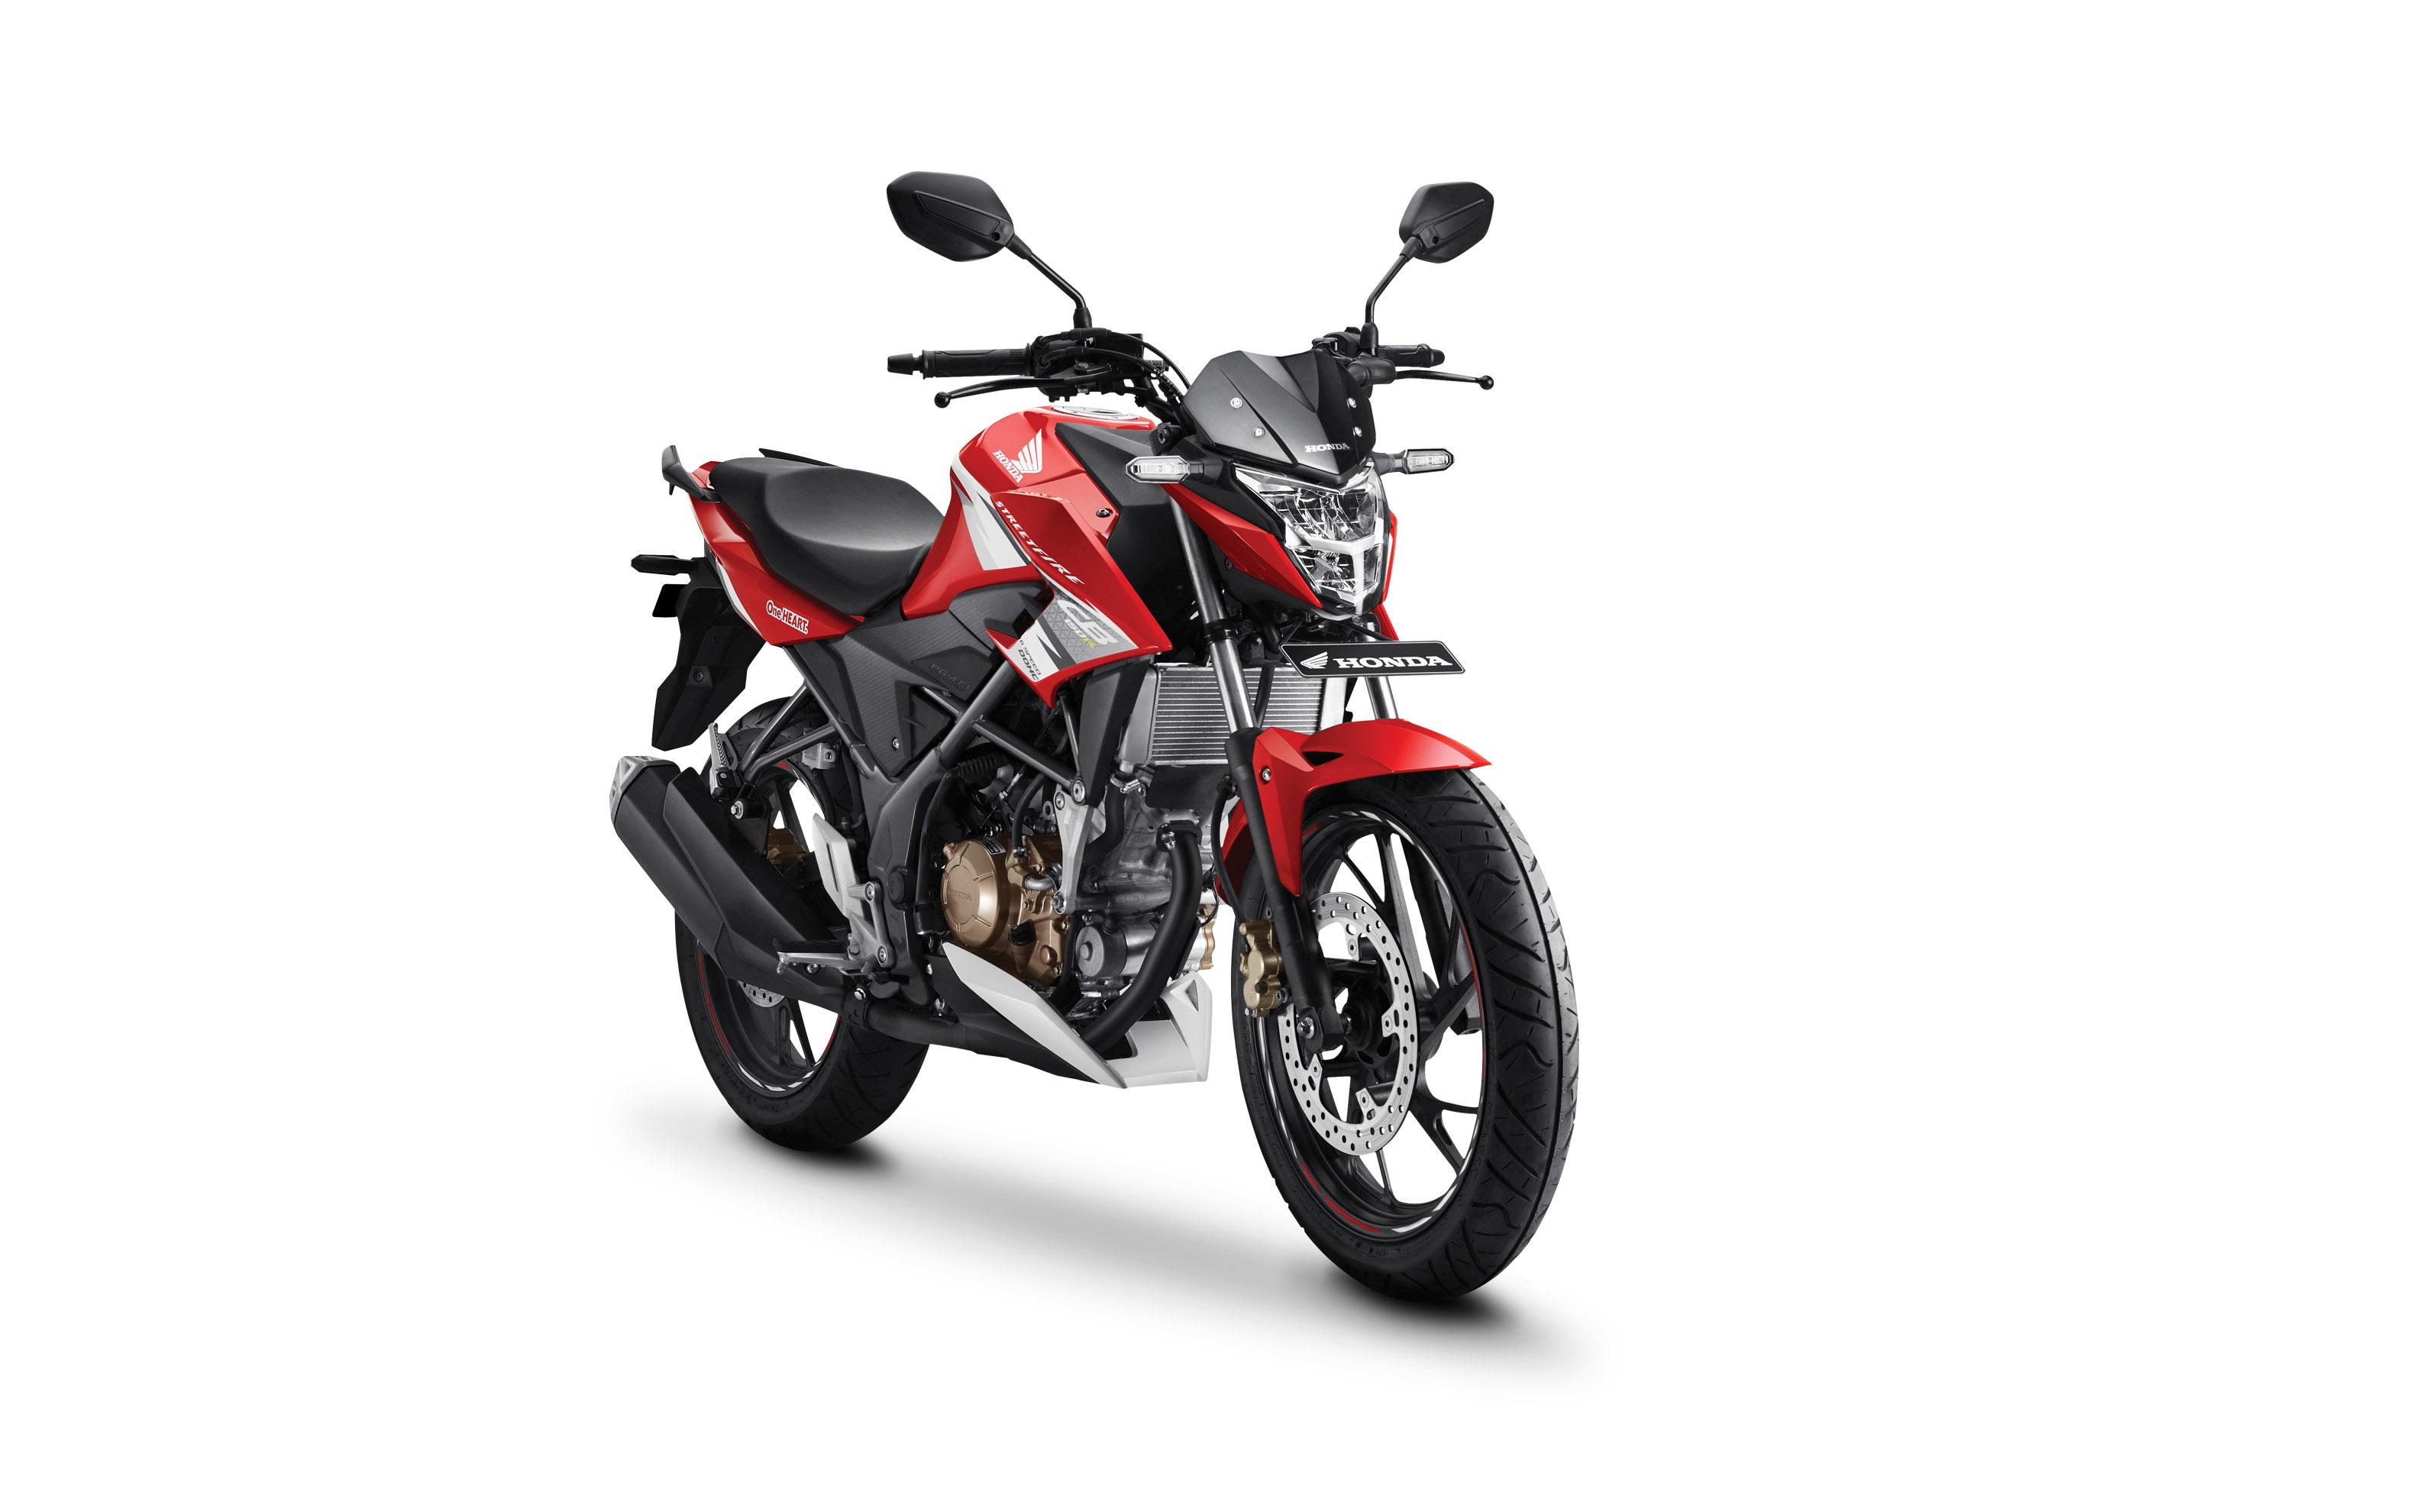 Warna Baru New Honda CB150R StreetFire Biar Seger Aluvimoto